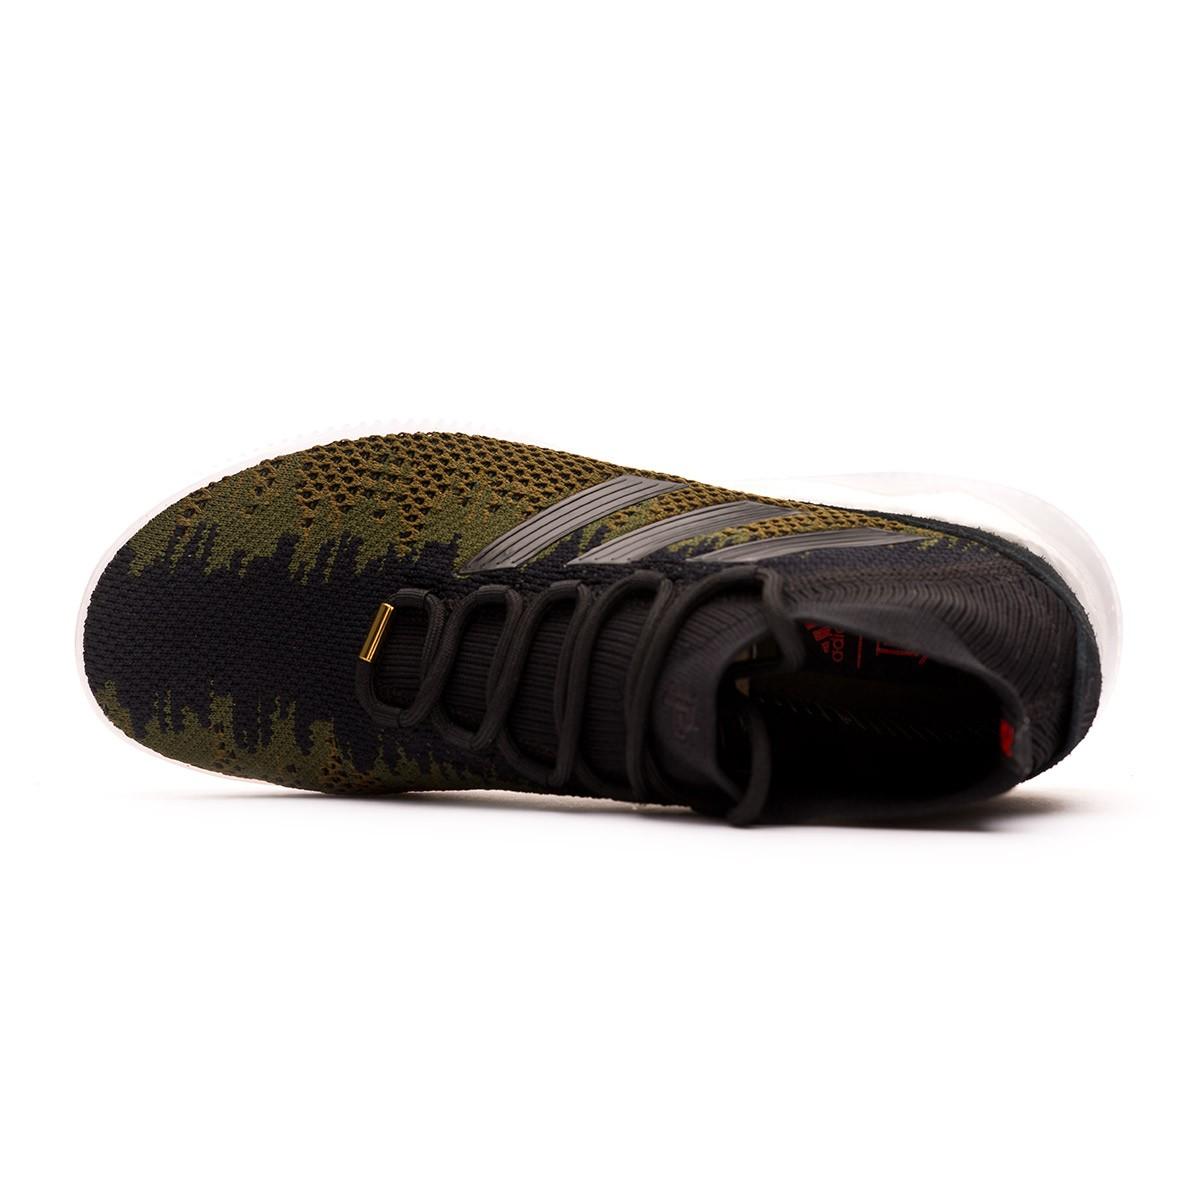 Pogba Tango Zapatilla Ultraboost Olive 18Tr Black Predator f6byvYg7